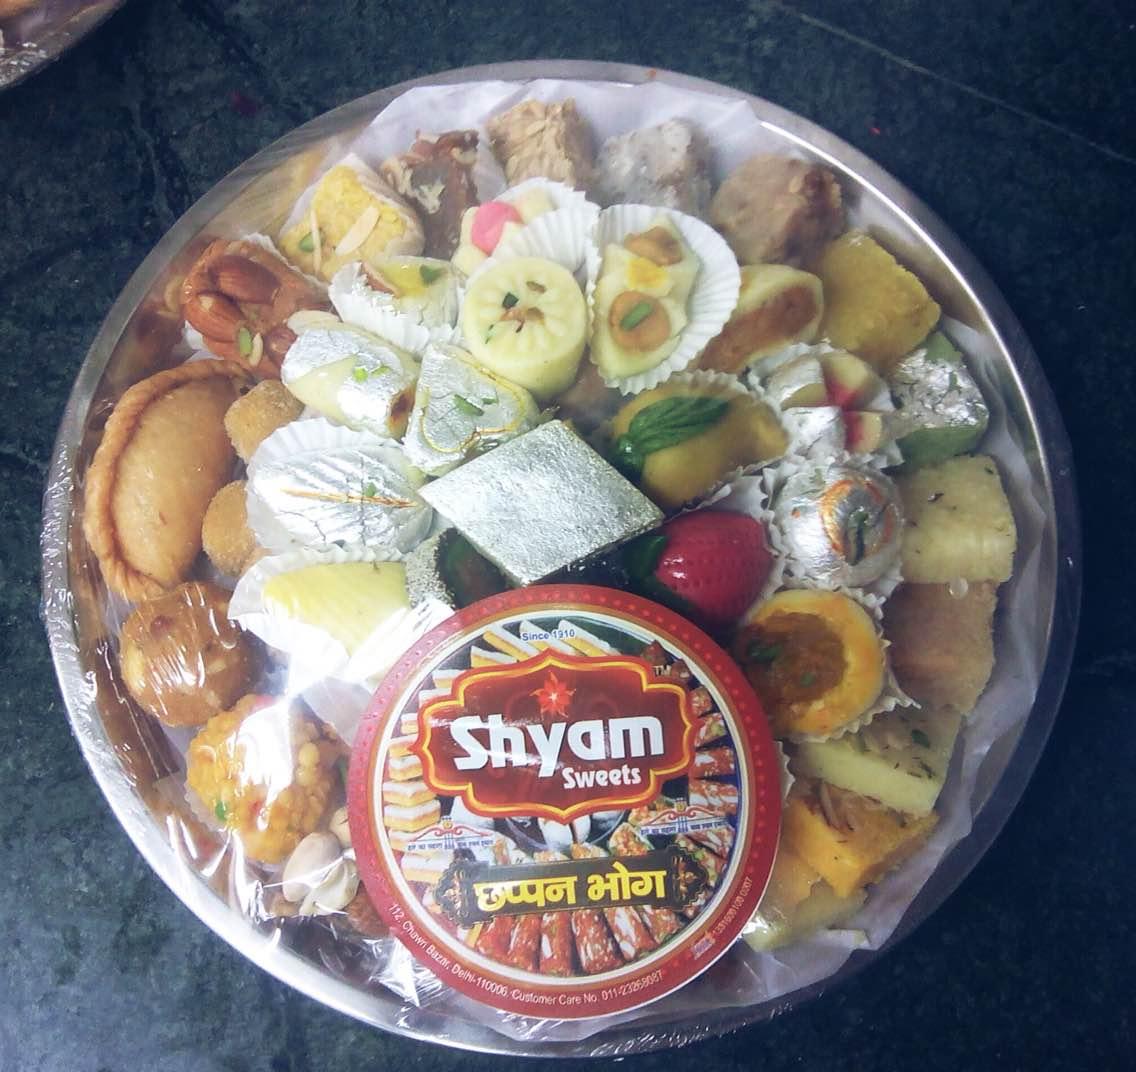 #food #foodporn #yum #instafood #yummy #munchies #amazing #instagood #photooftheday #sweet #dinner #lunch #breakfast #fresh #tasty #food #delish #delicious #eating #foodpic #foodpics #eat #hungry #foodgasm #hot #foods#56 bhog#chhapn bhog#shyamsweets